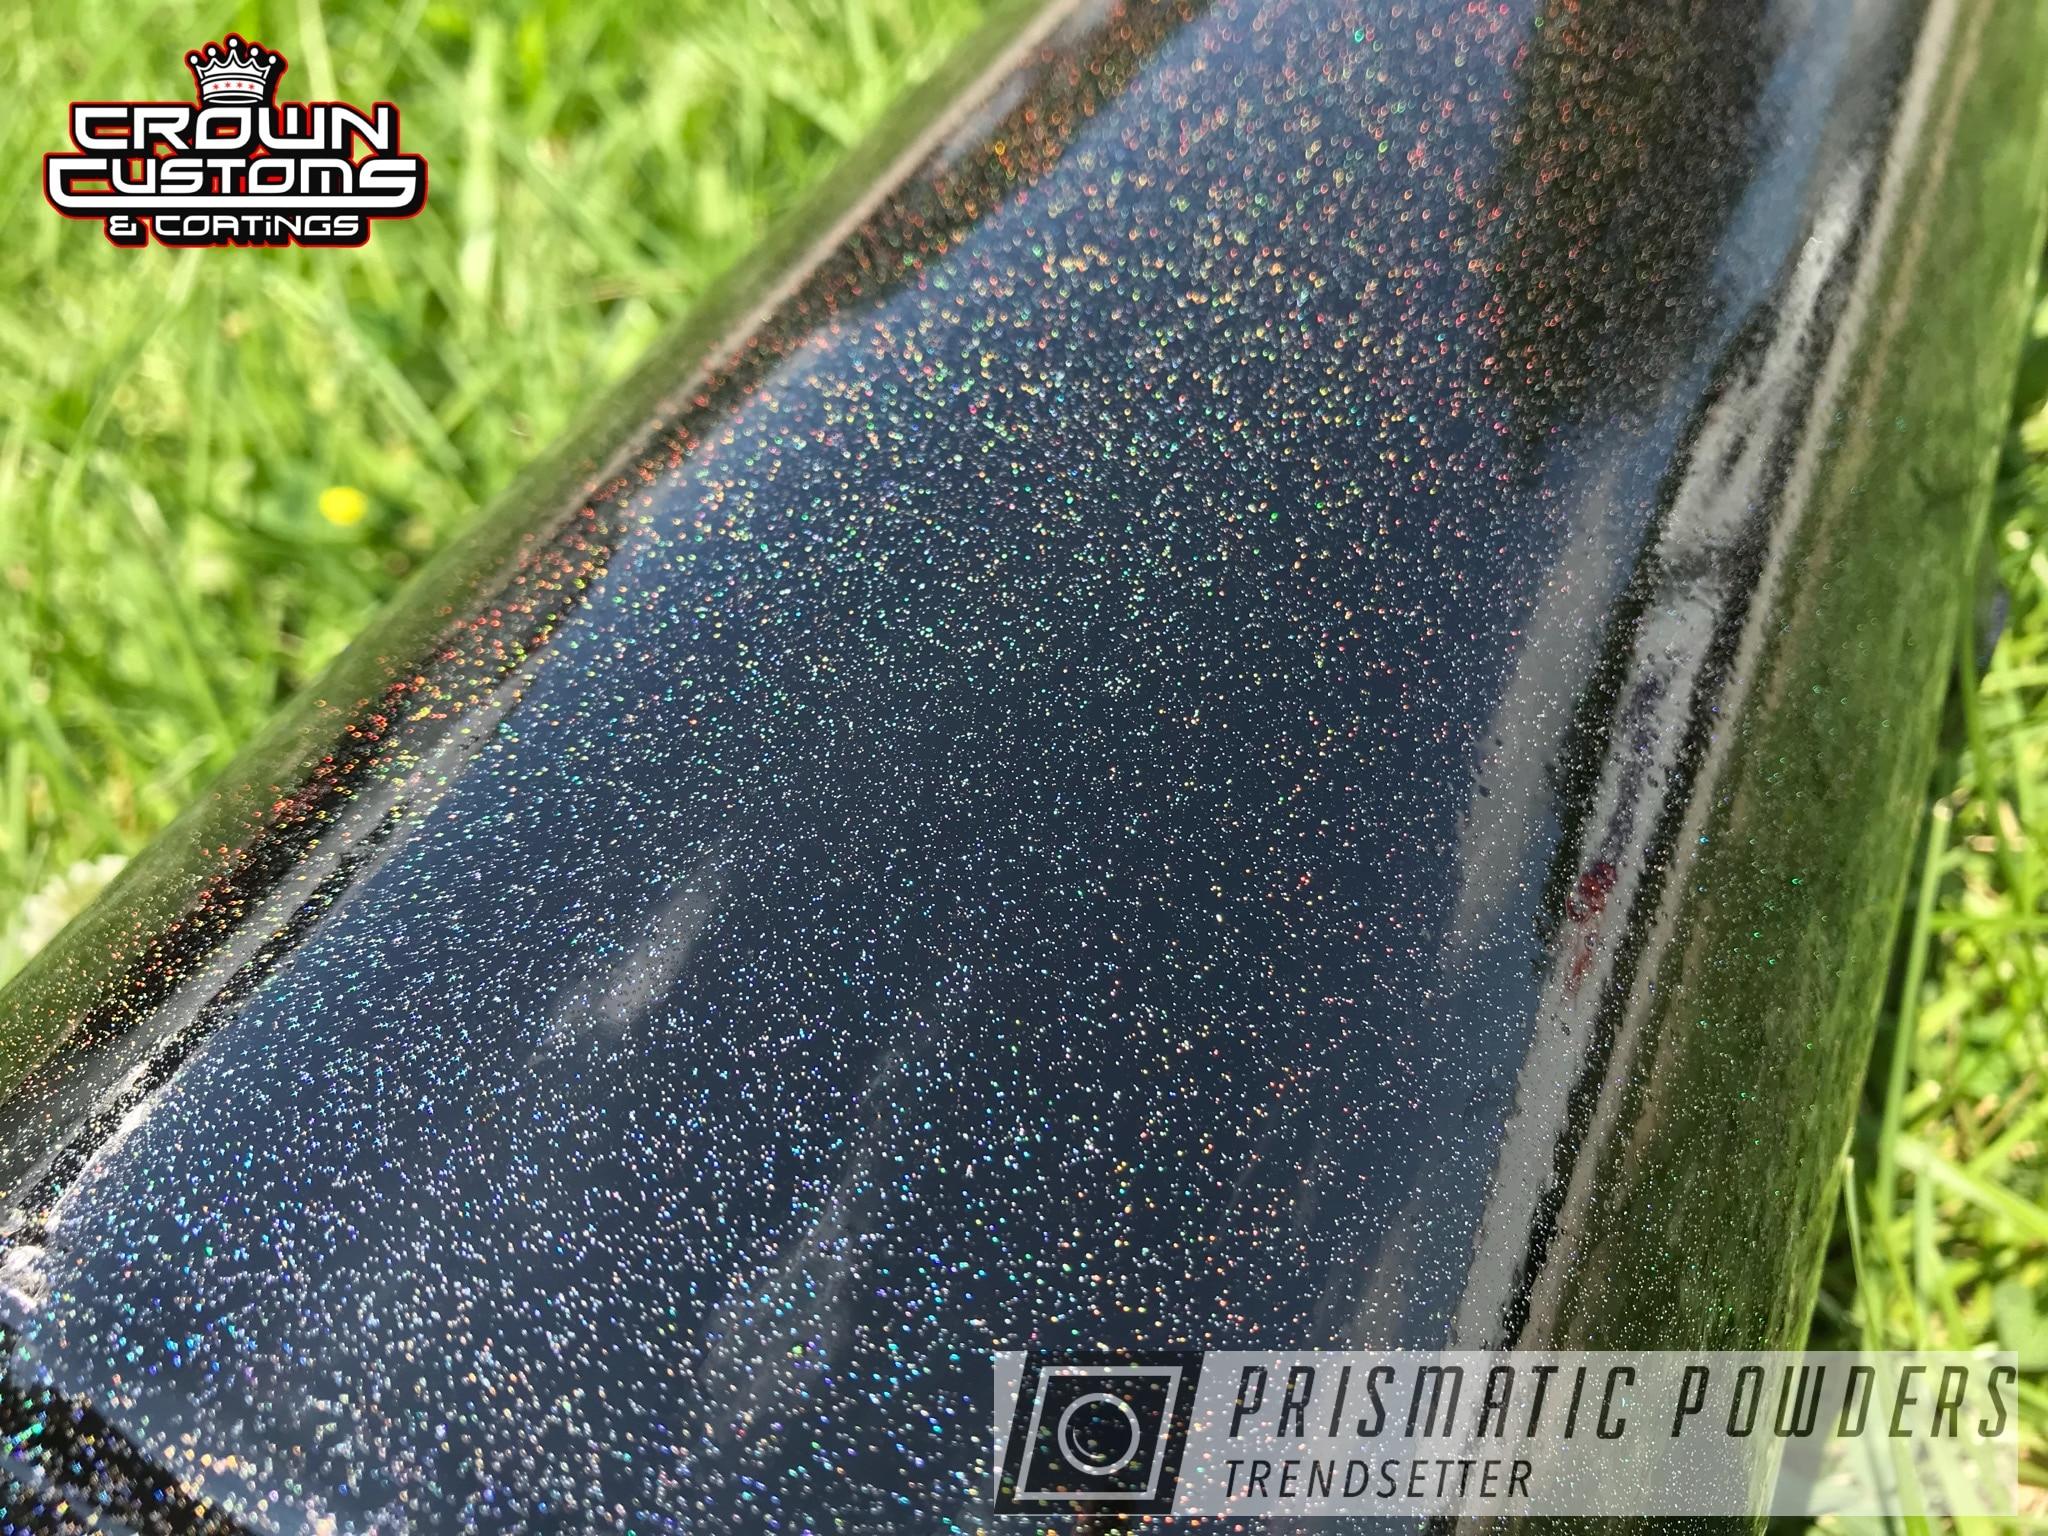 Powder Coating: Automotive,Air Ride Tank,Air Suspension,Air Ride,Air Suspension Tank,Metallic Powder Coating,Rainbow's End PMB-2691